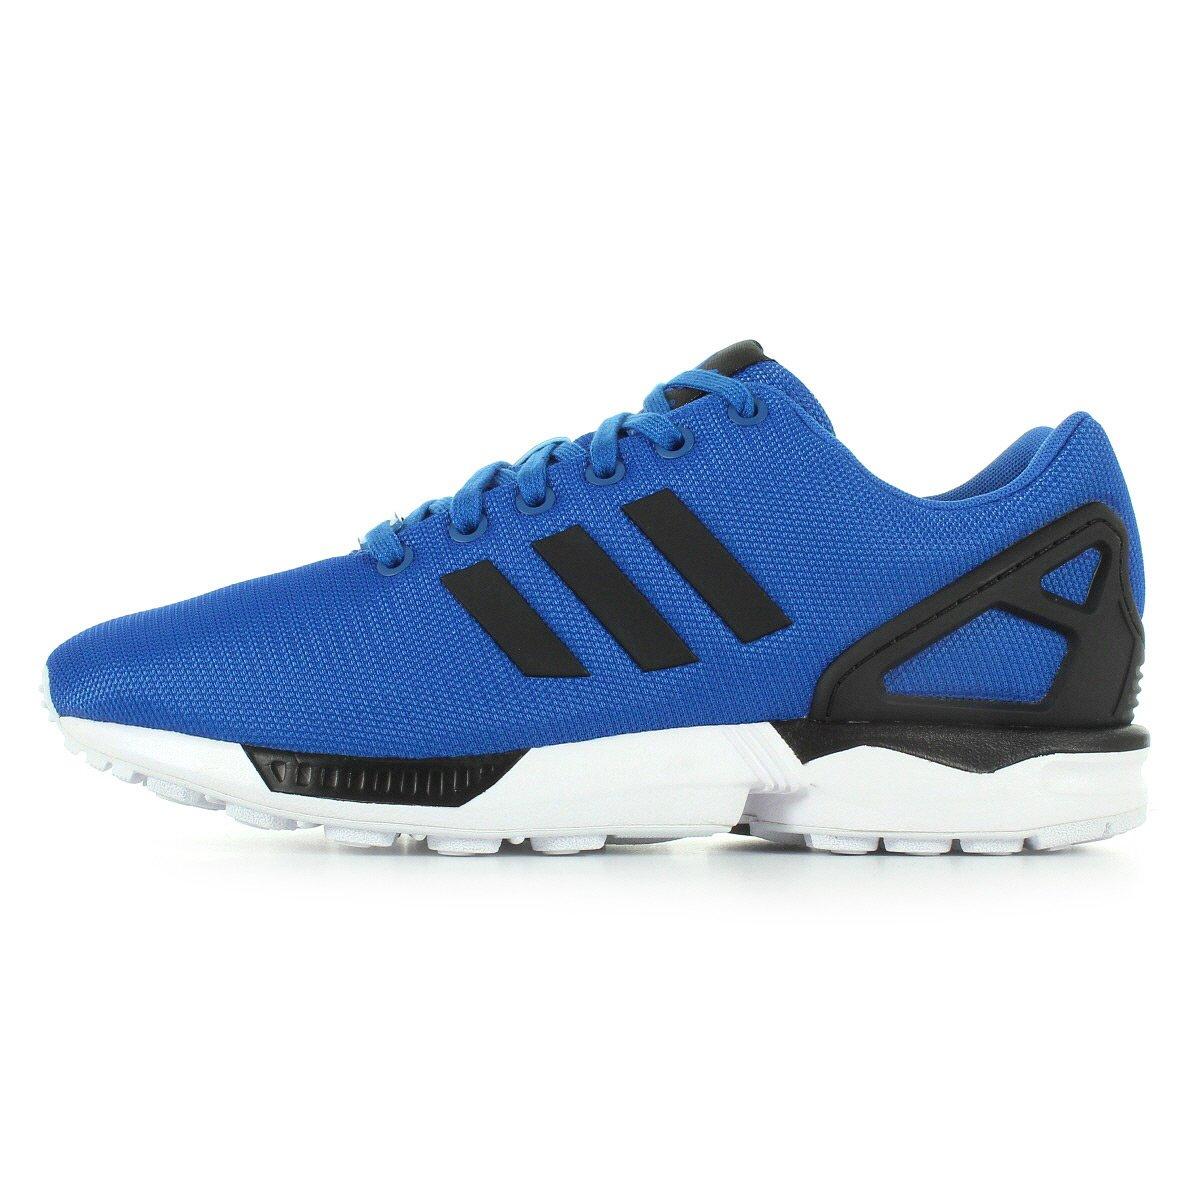 new concept 4fb18 09f61 Adidas ZX Flux 8k Textile M21328, Trainers - EU 49 1/3 ...